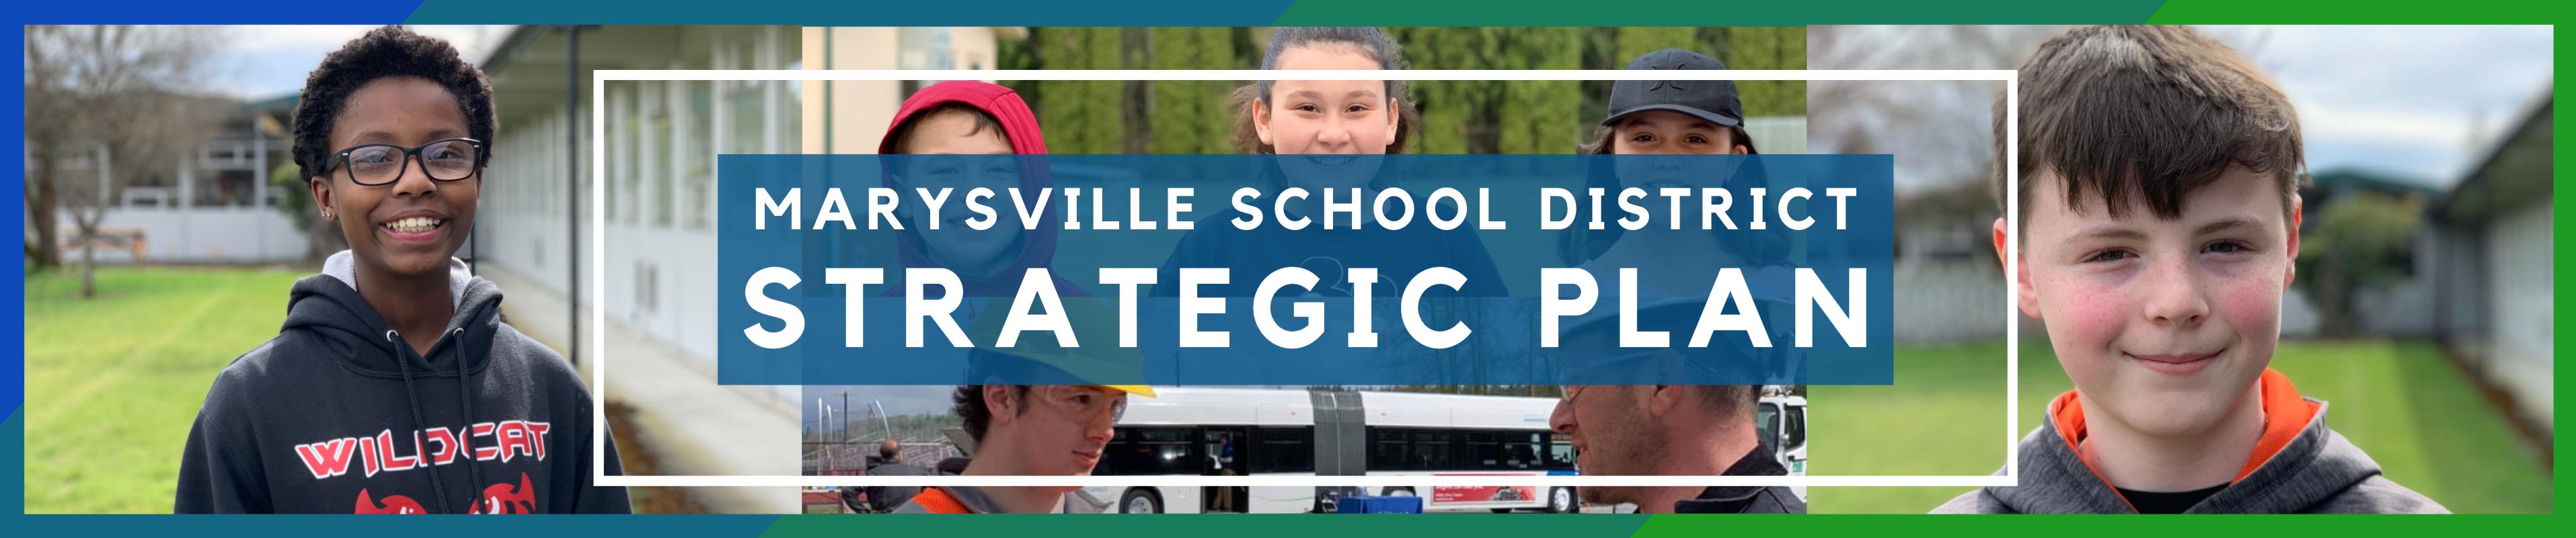 Marysville School District Strategic Plan